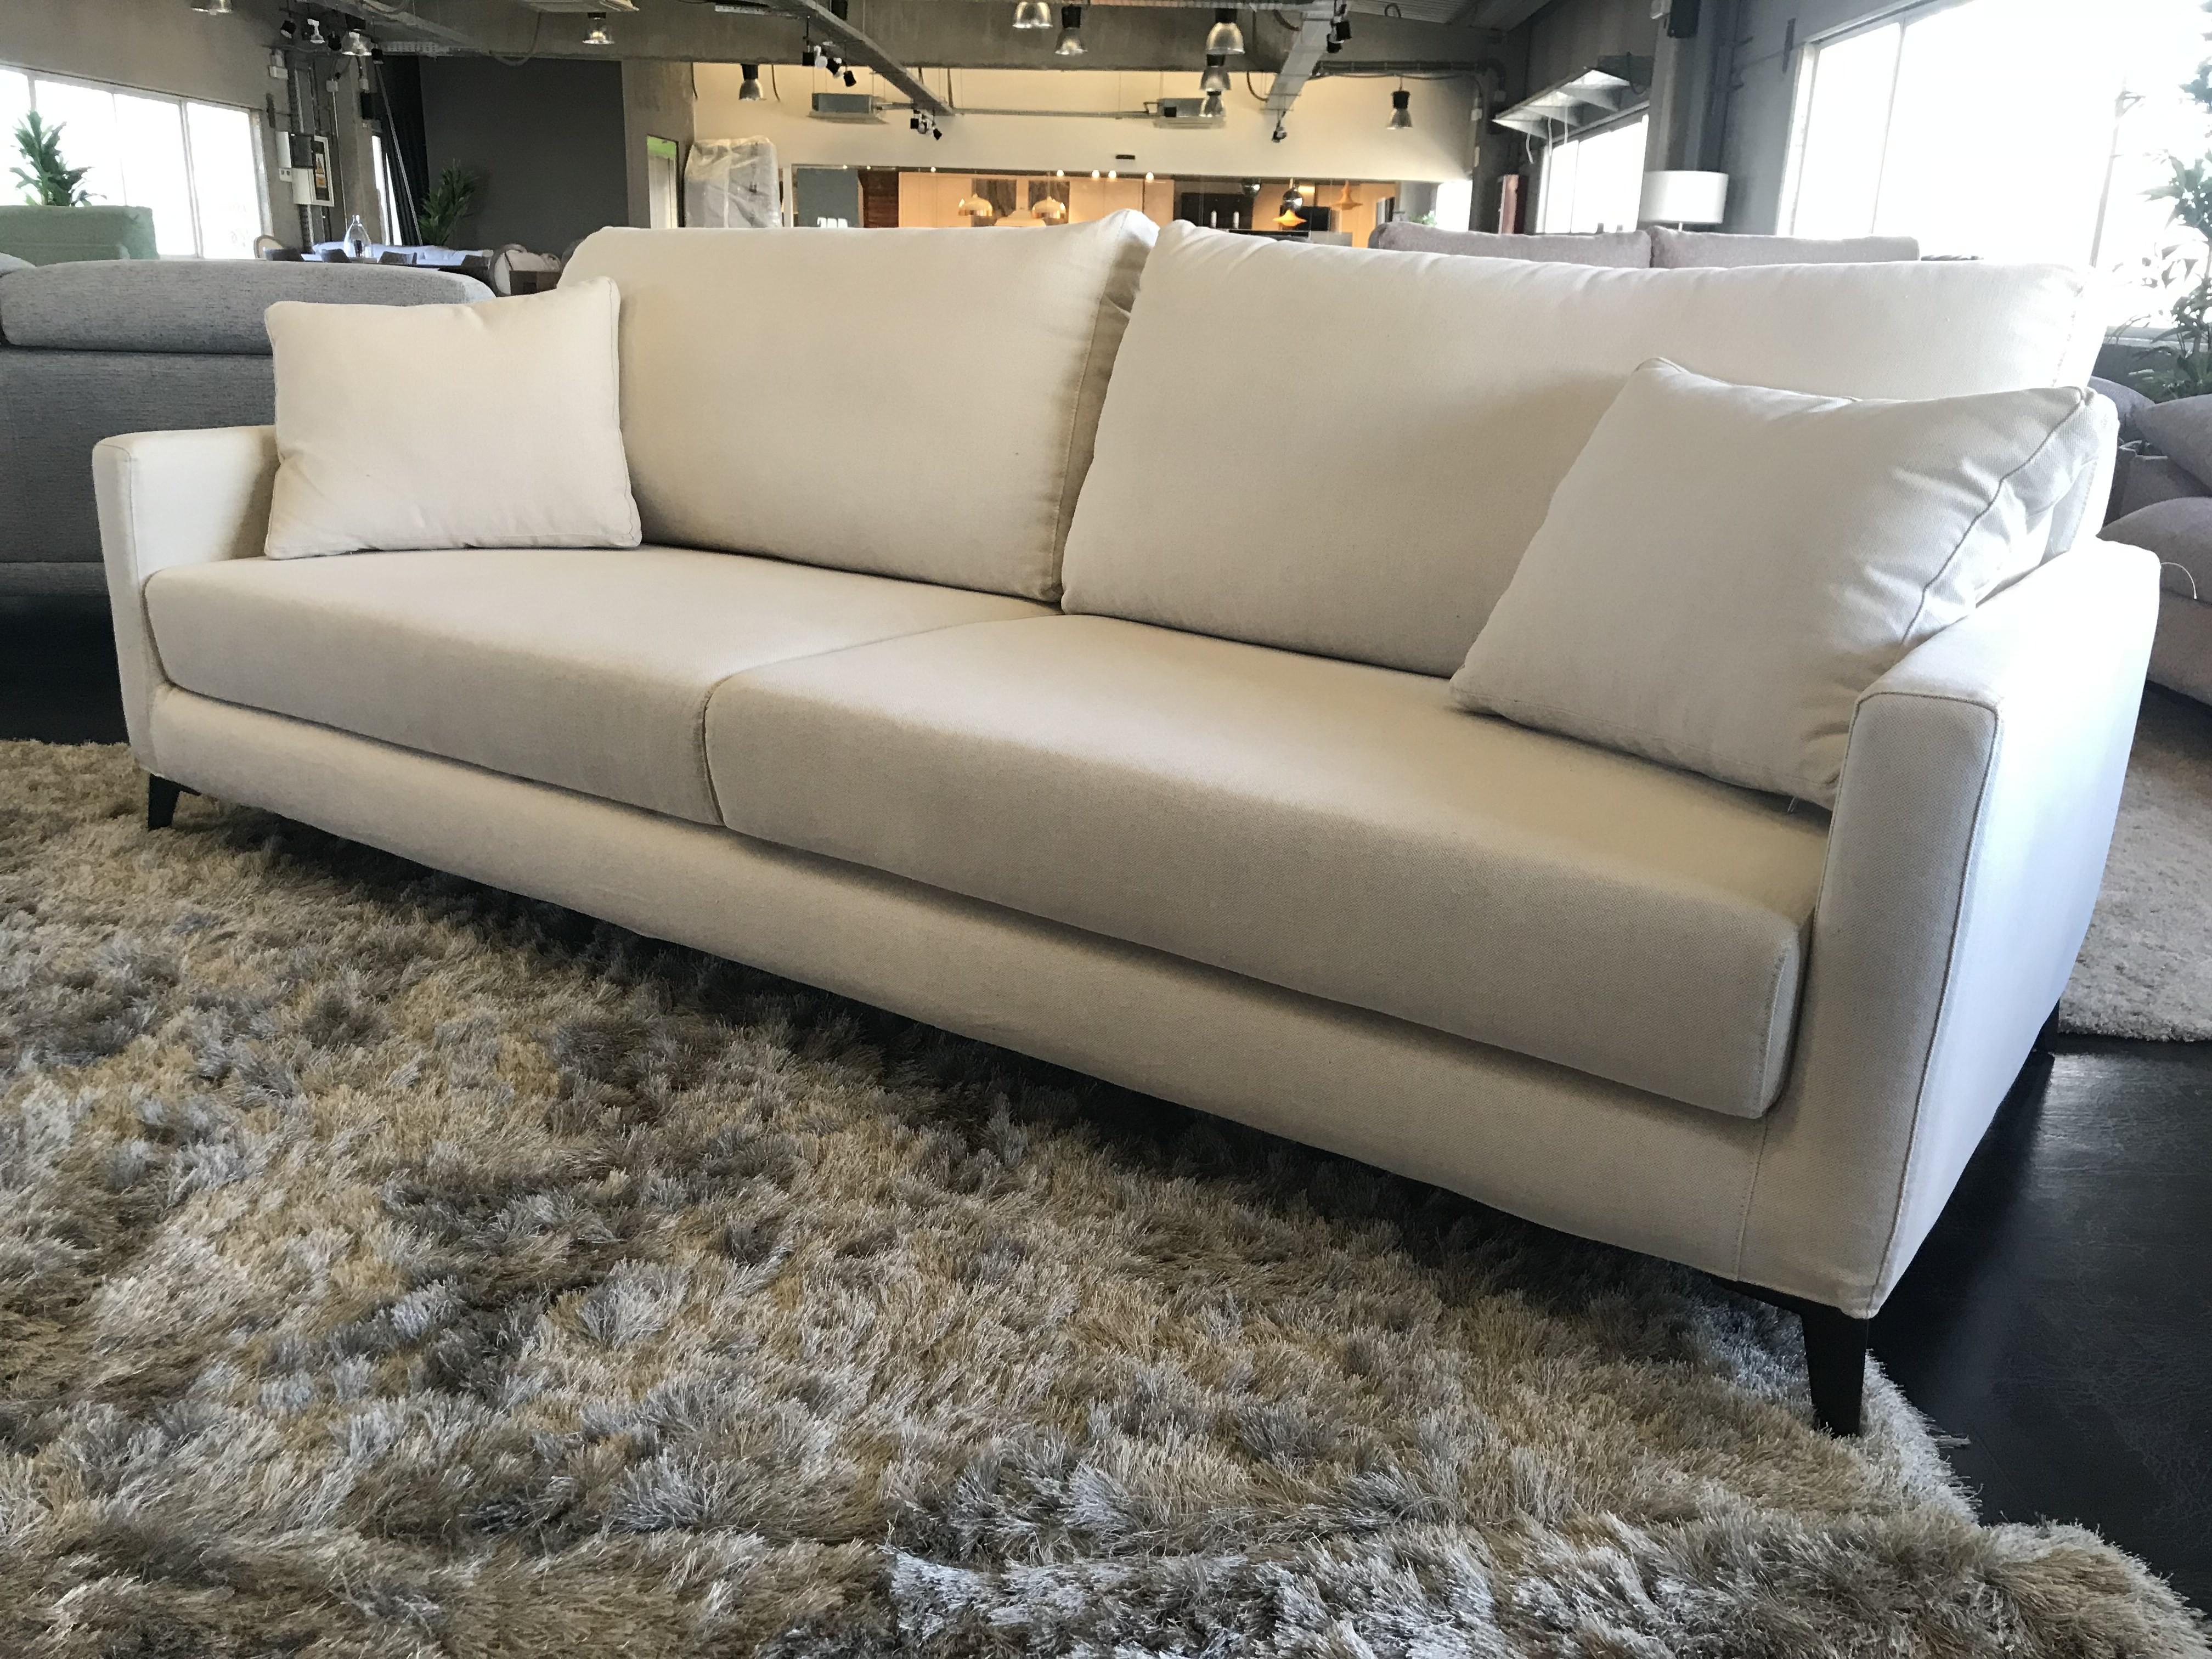 Sofas baratos online outlet baci living room for Liquidacion muebles online